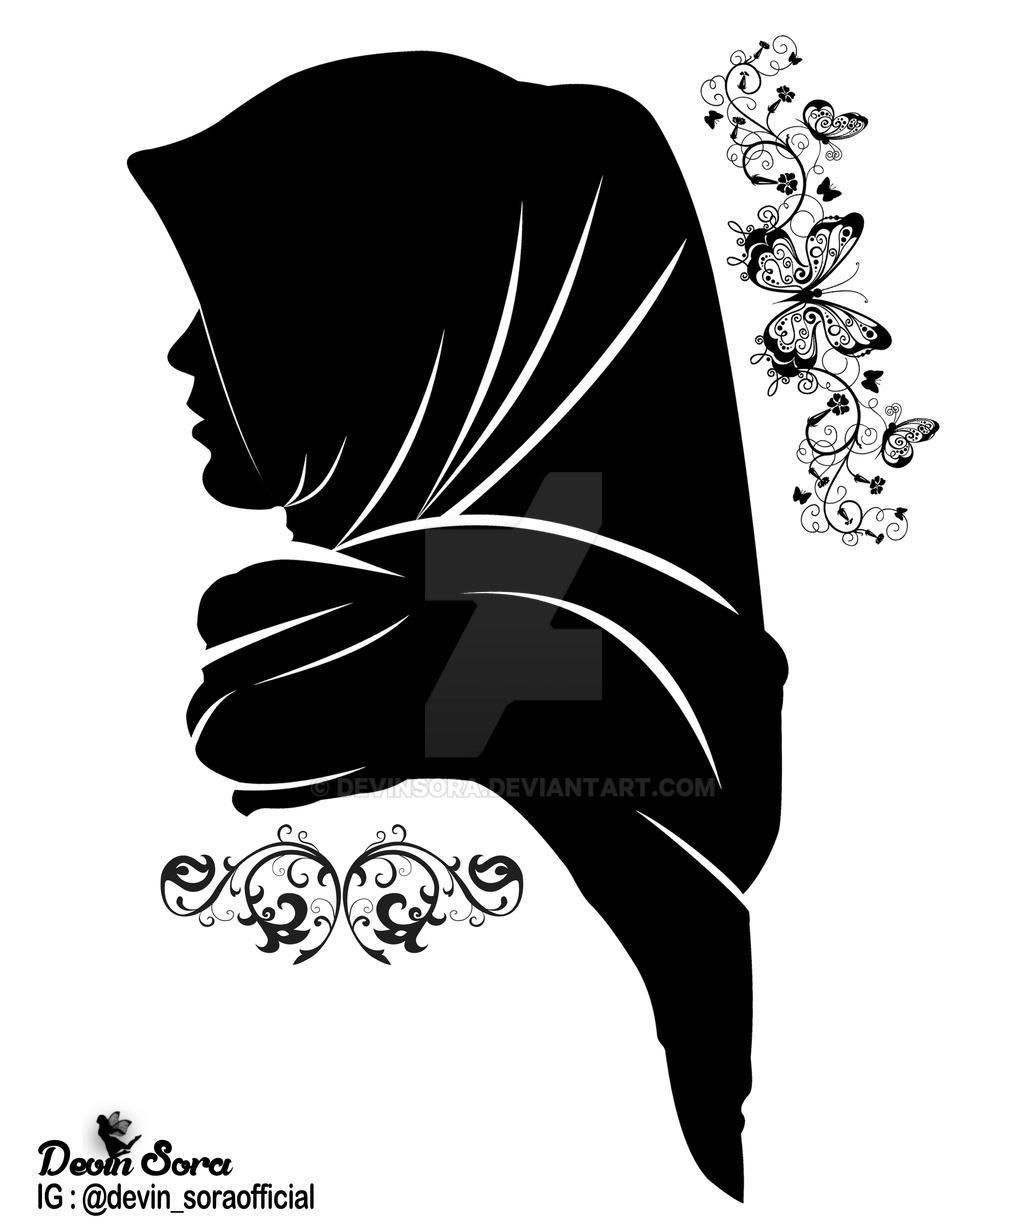 Gambar Wanita Hijab Hitam Putih Kartun Gambar Hijab Wanita